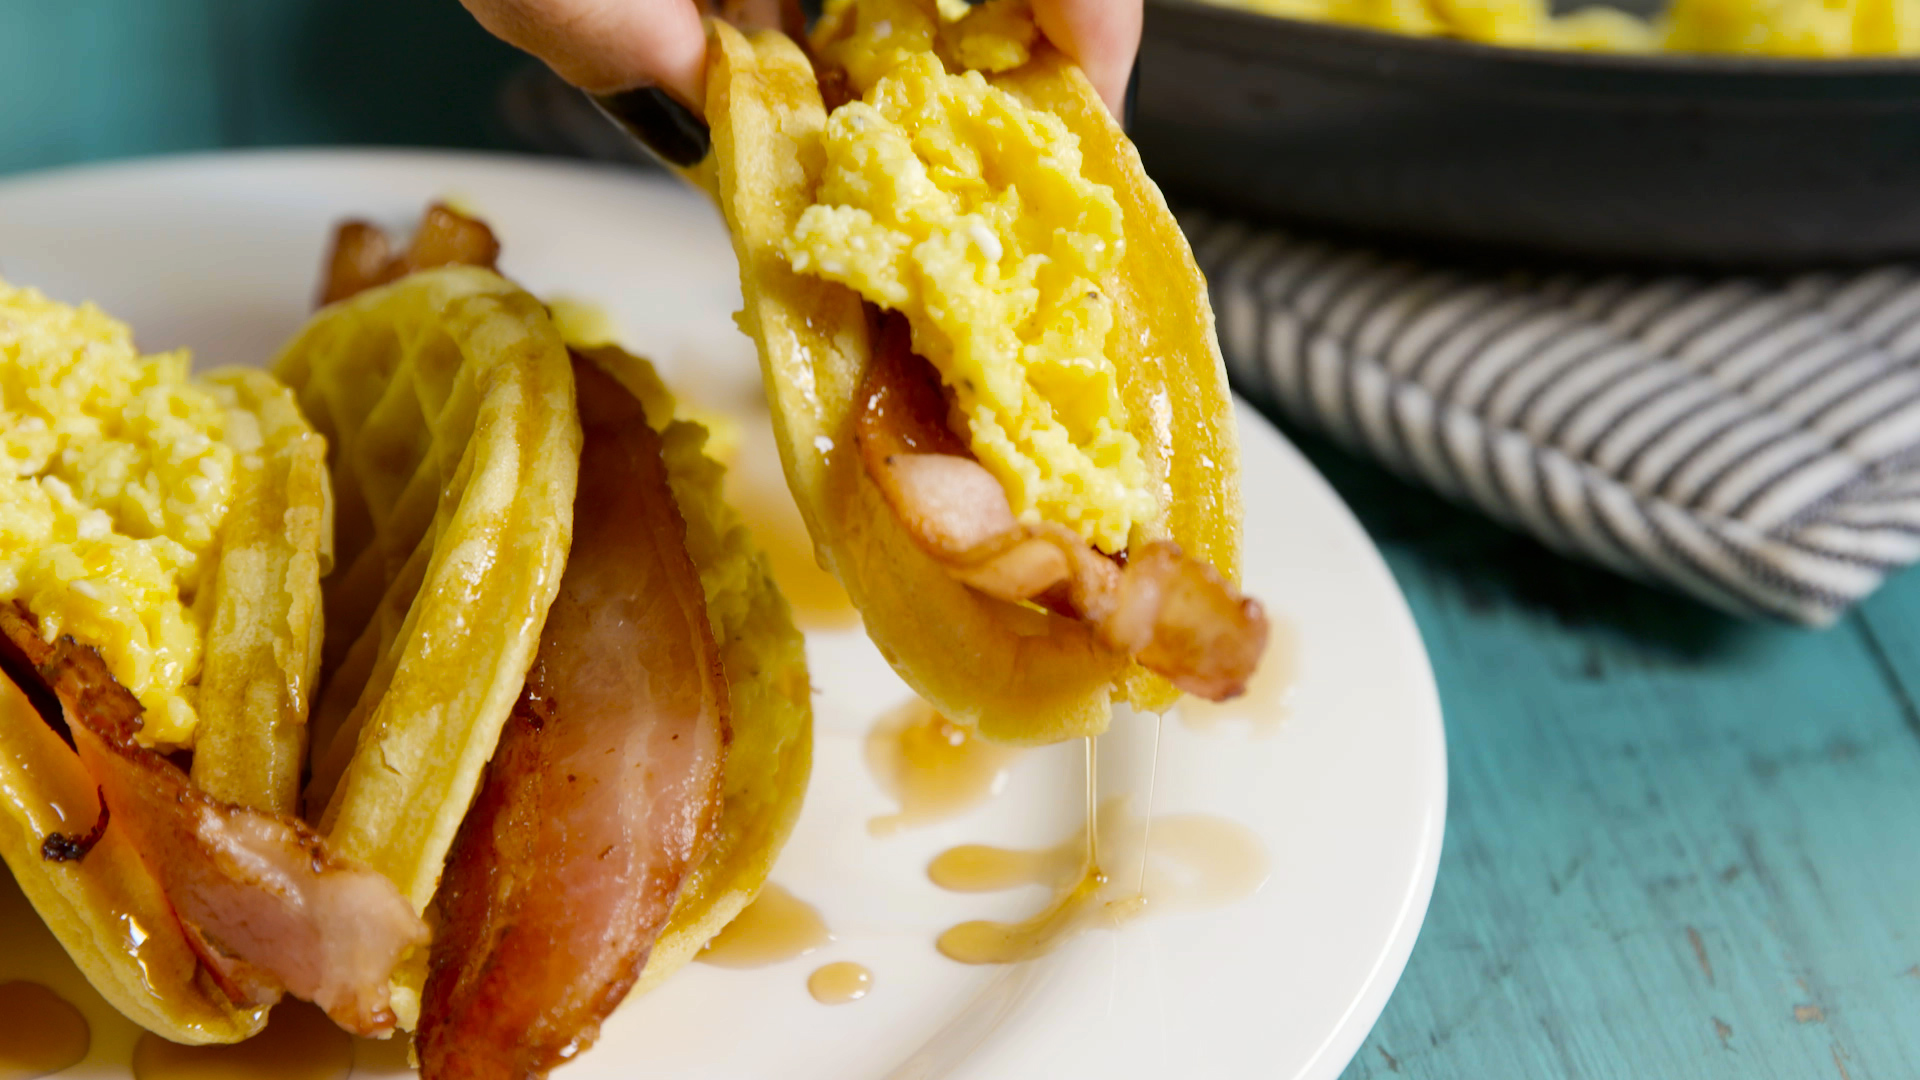 How to Make Waffle Tacos